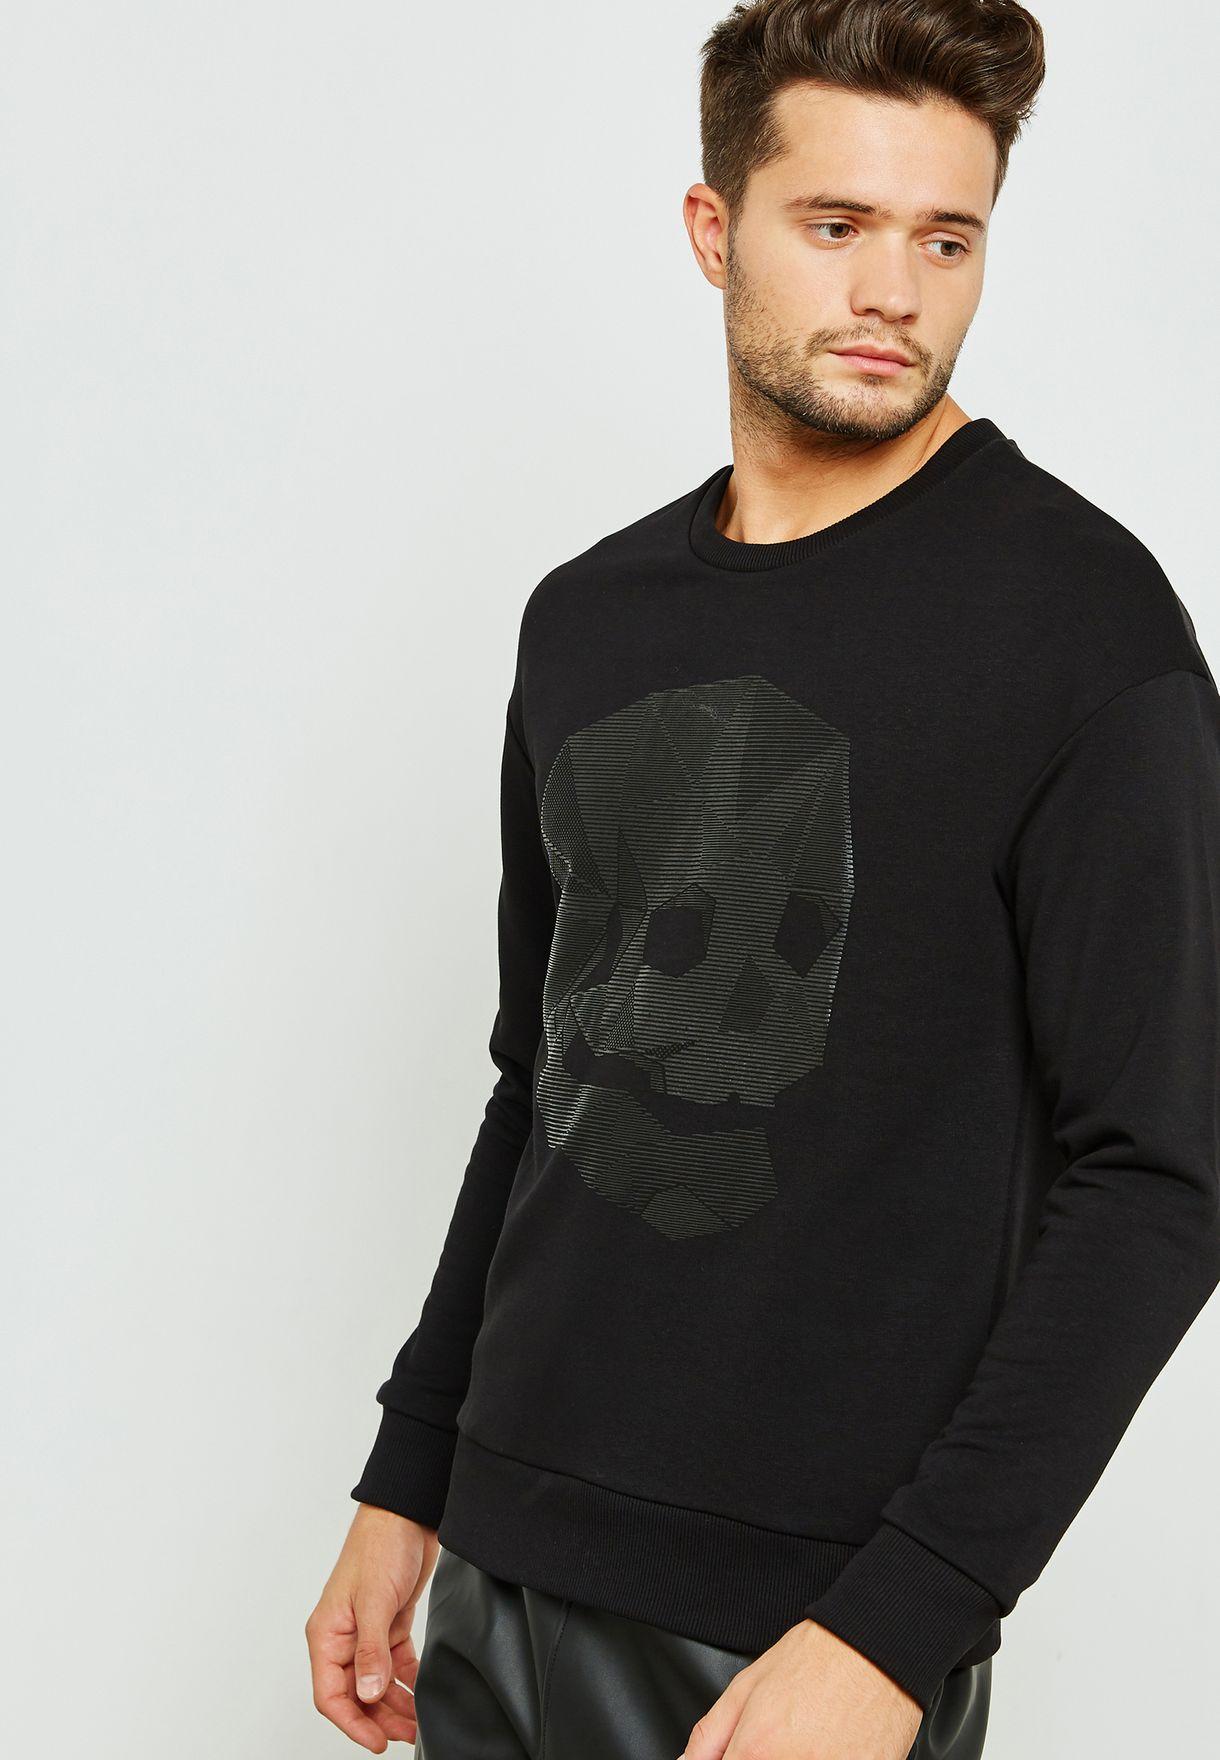 finest selection d74a2 36efc Dene Skull Sweatshirt